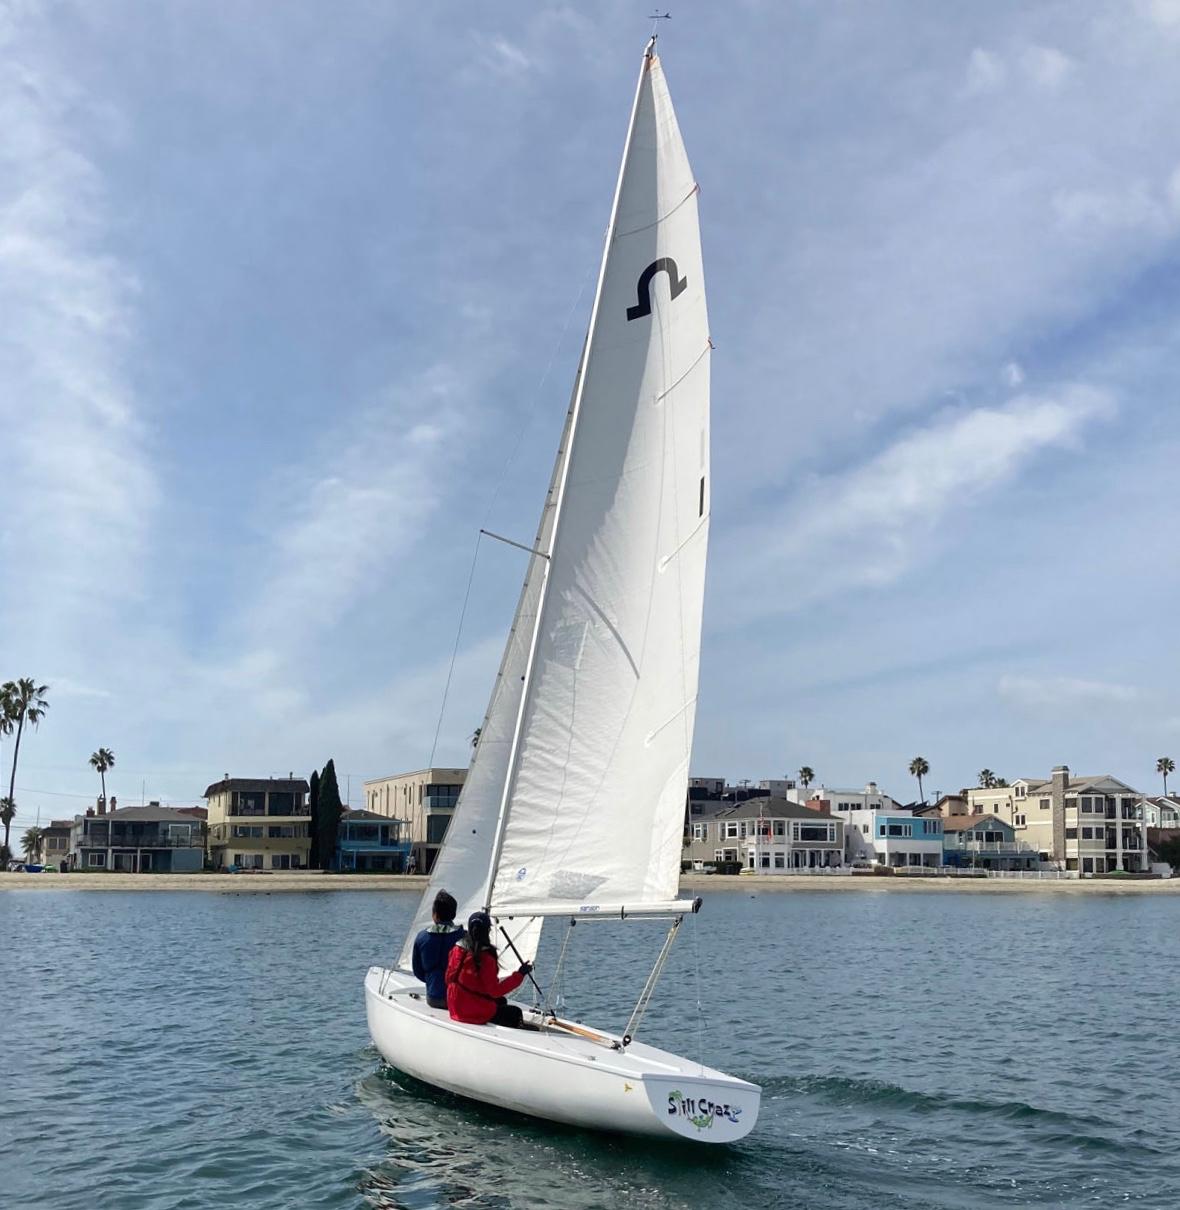 Long Beach Yacht Club Soling Fleet